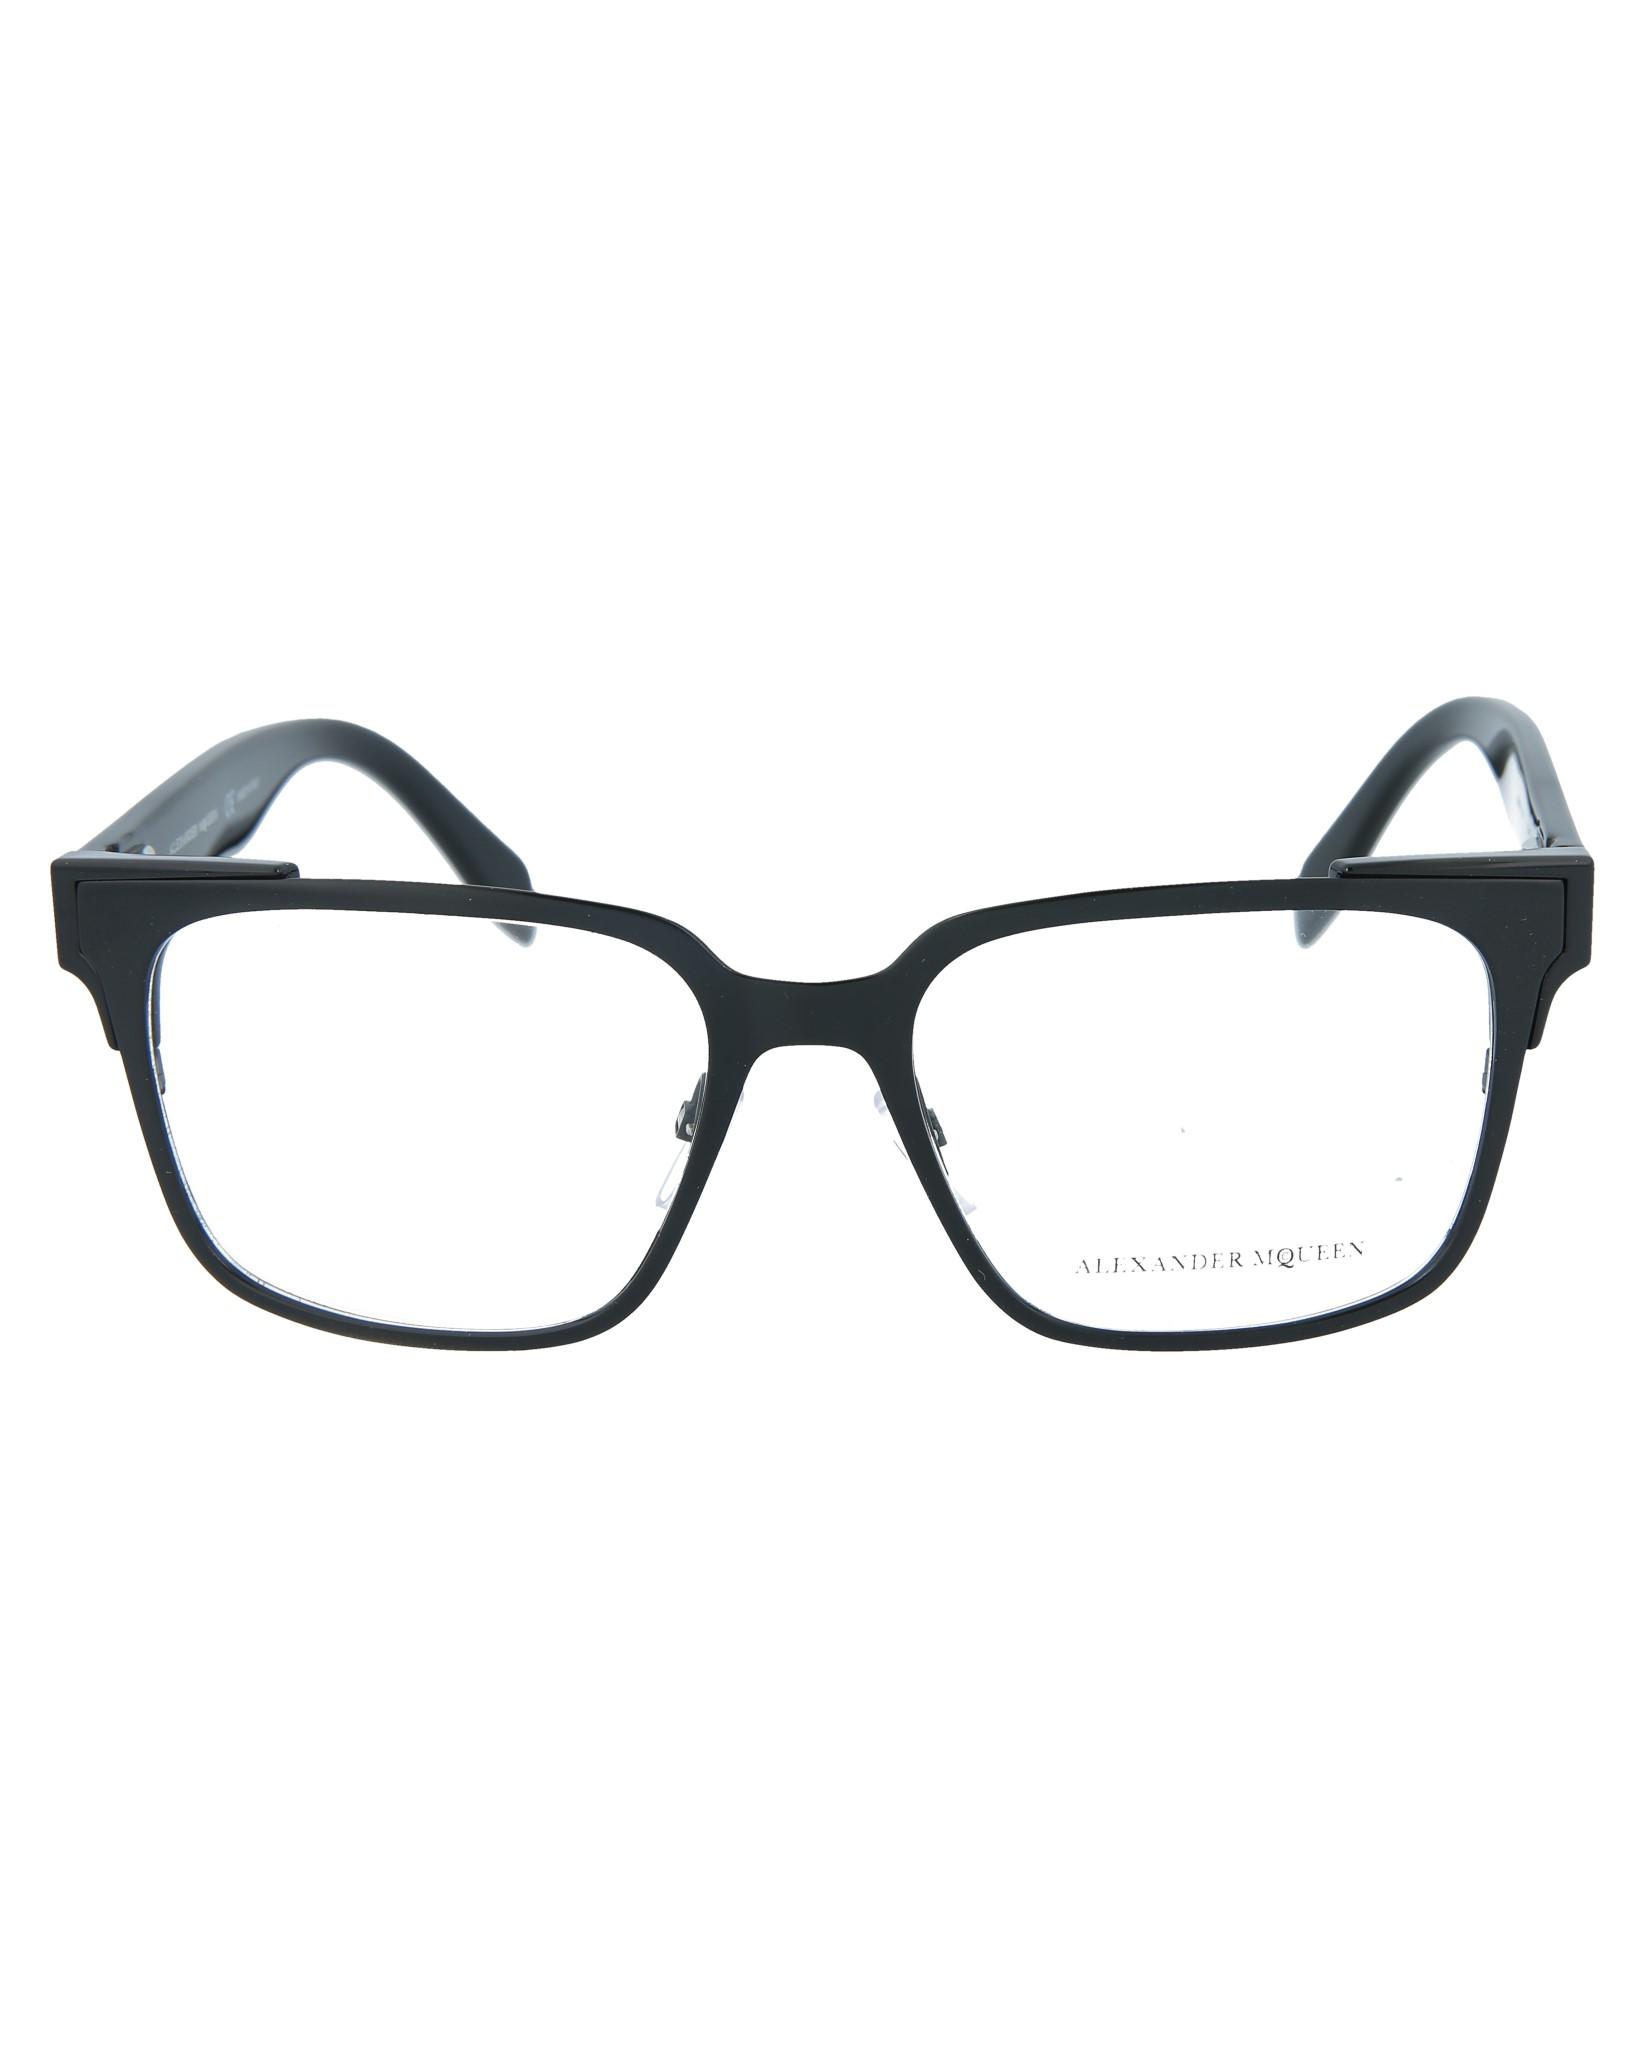 deb53290b7 Alexander McQueen Mens Square Rectangle Optical Frames AM0014O-30000138-001